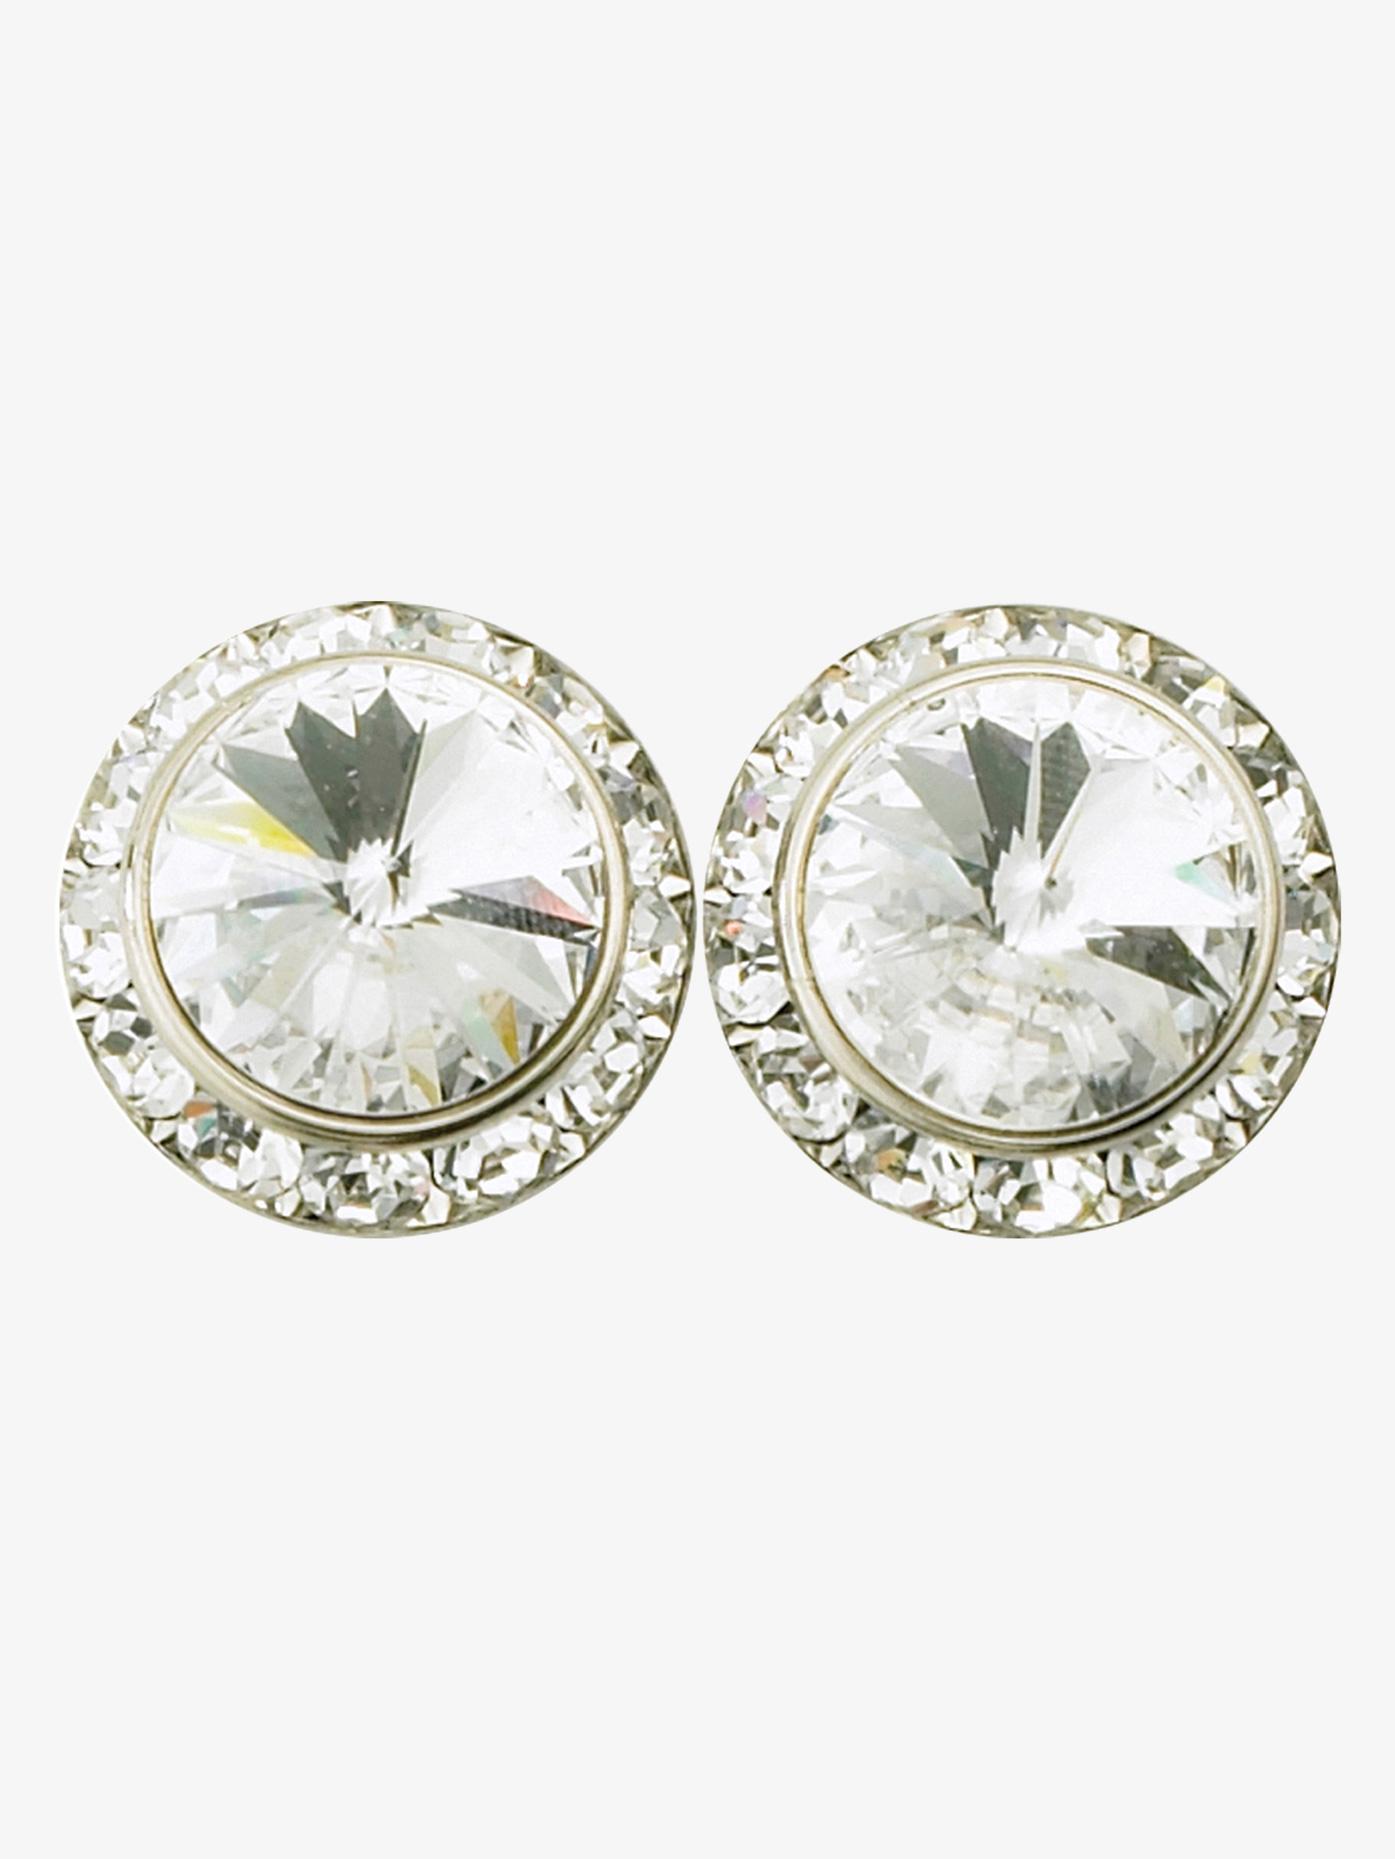 Rhinestones Unlimited 15mm Pierced Earrings with Swarovski Crystals RU048